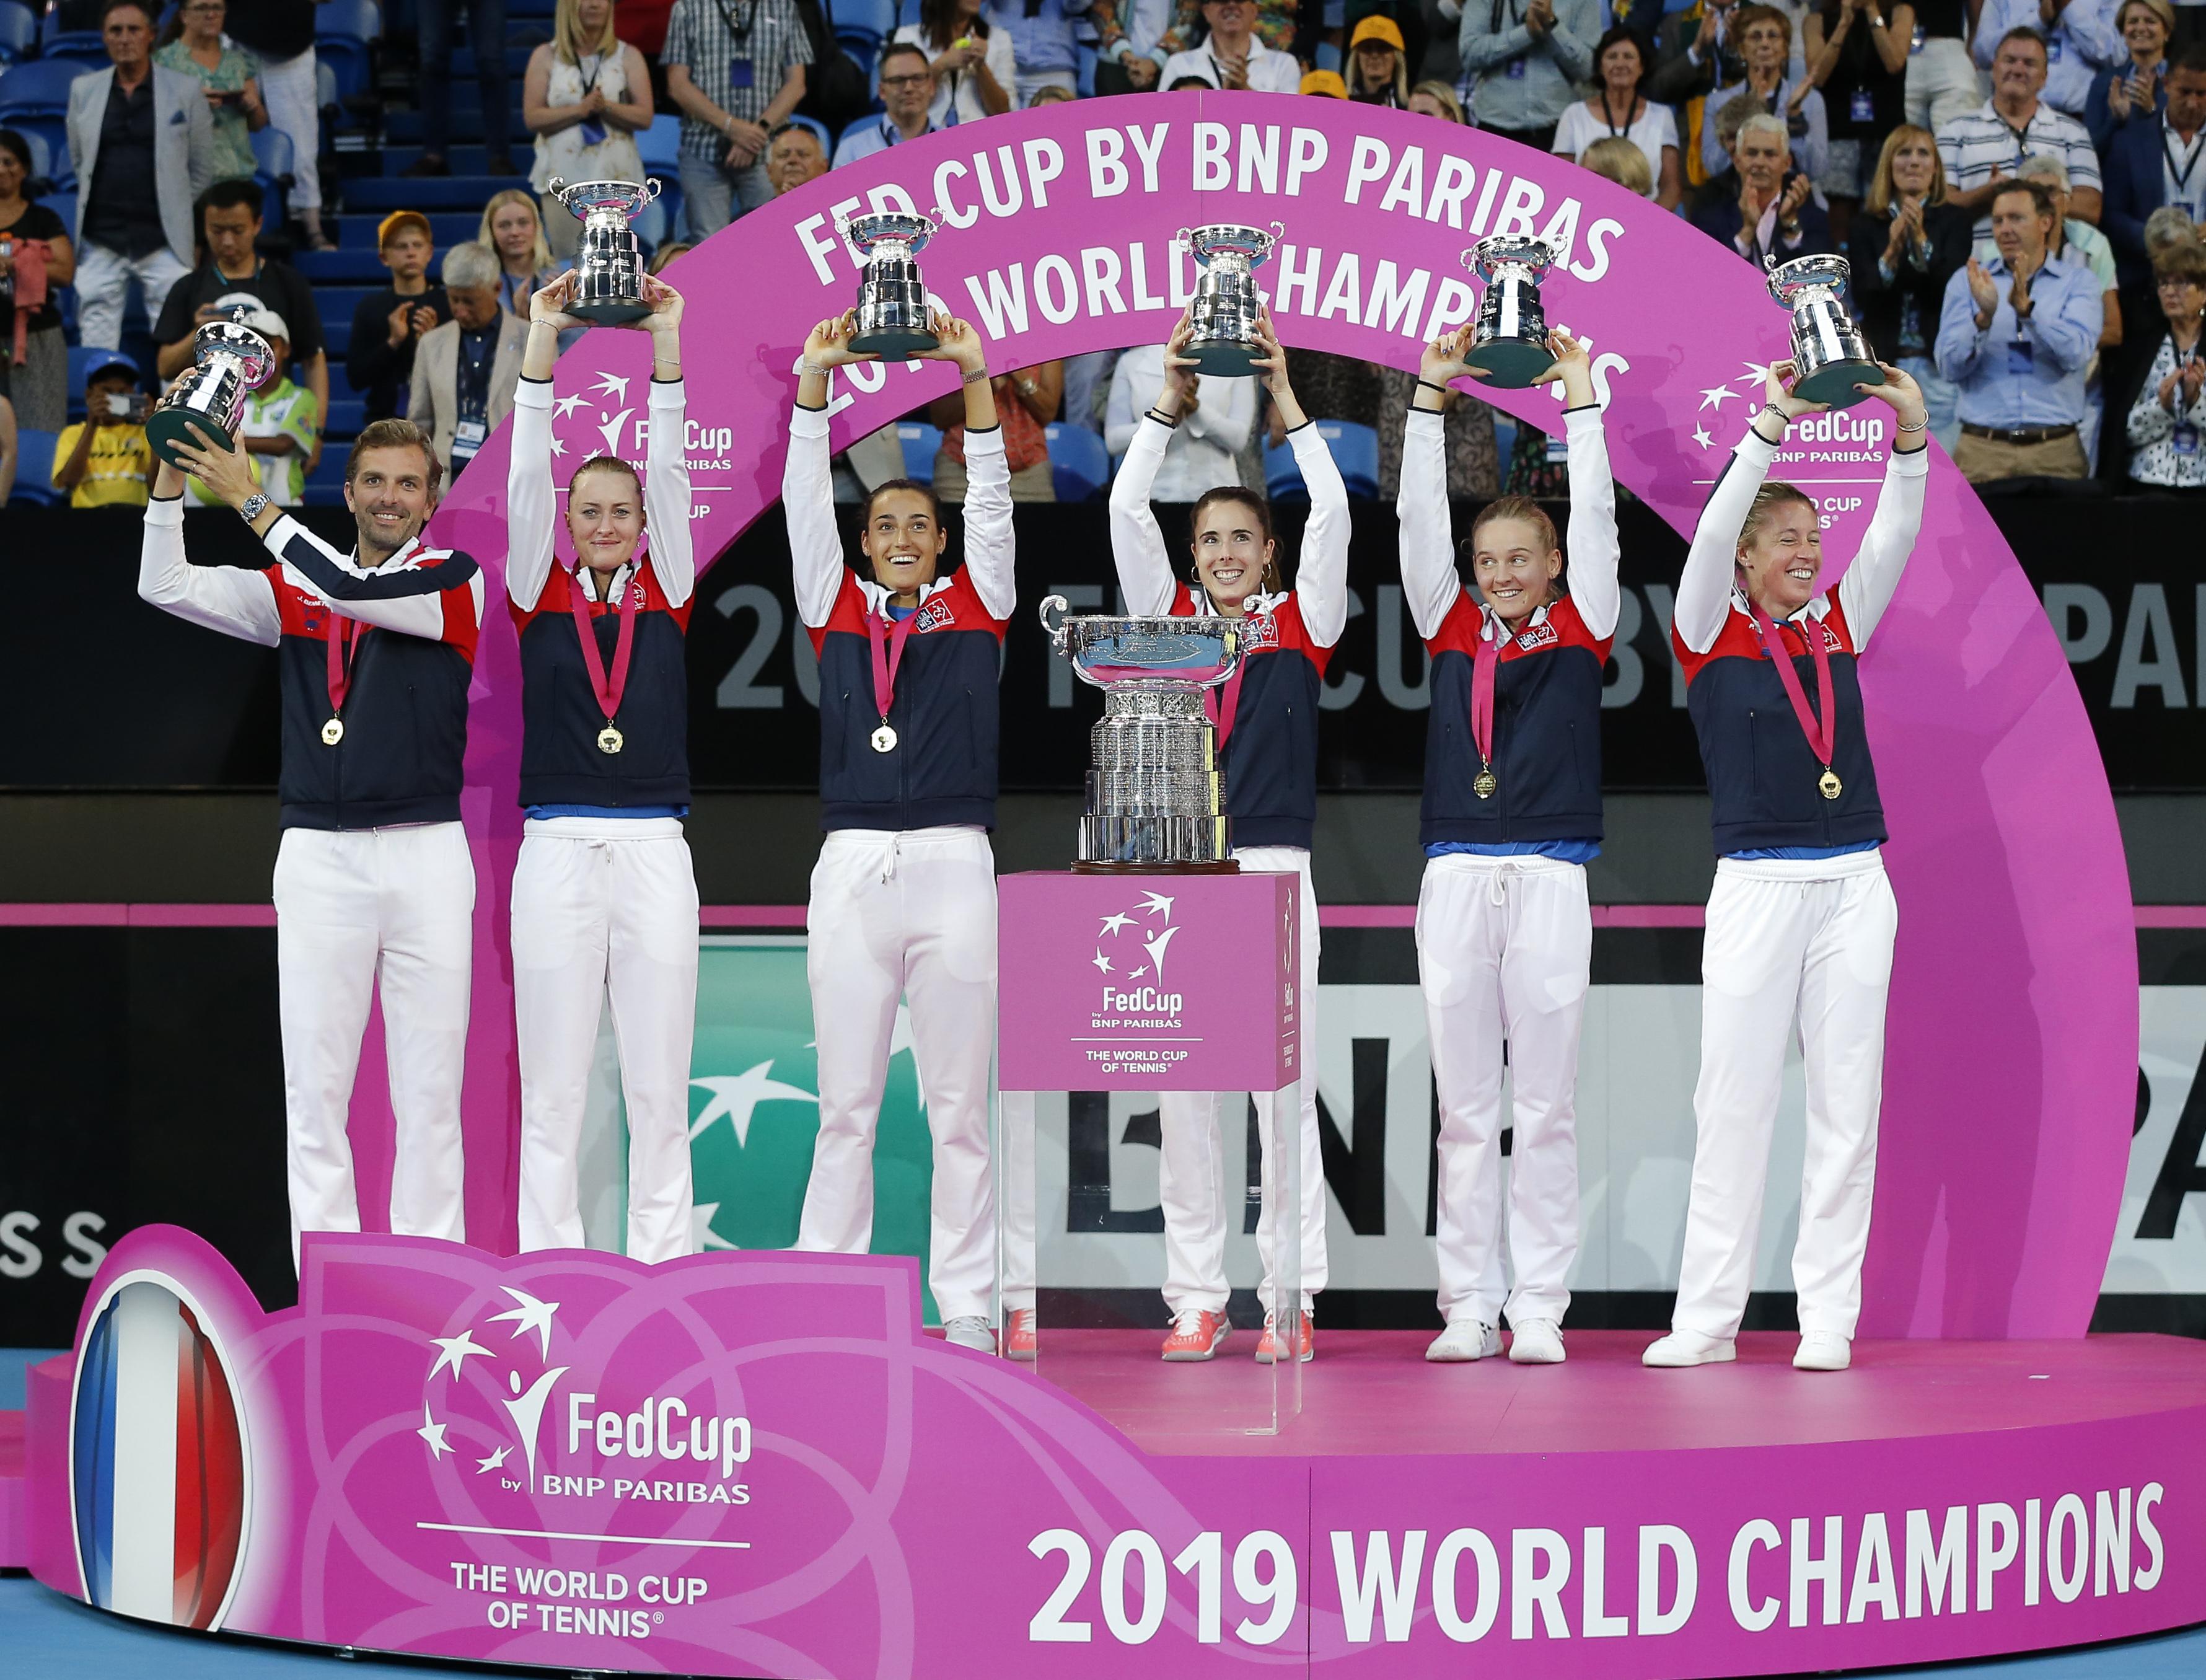 Tennis - Coronavirus : la Fed Cup reportée, le Masters 1000 de Monte-Carlo à huis clos ?